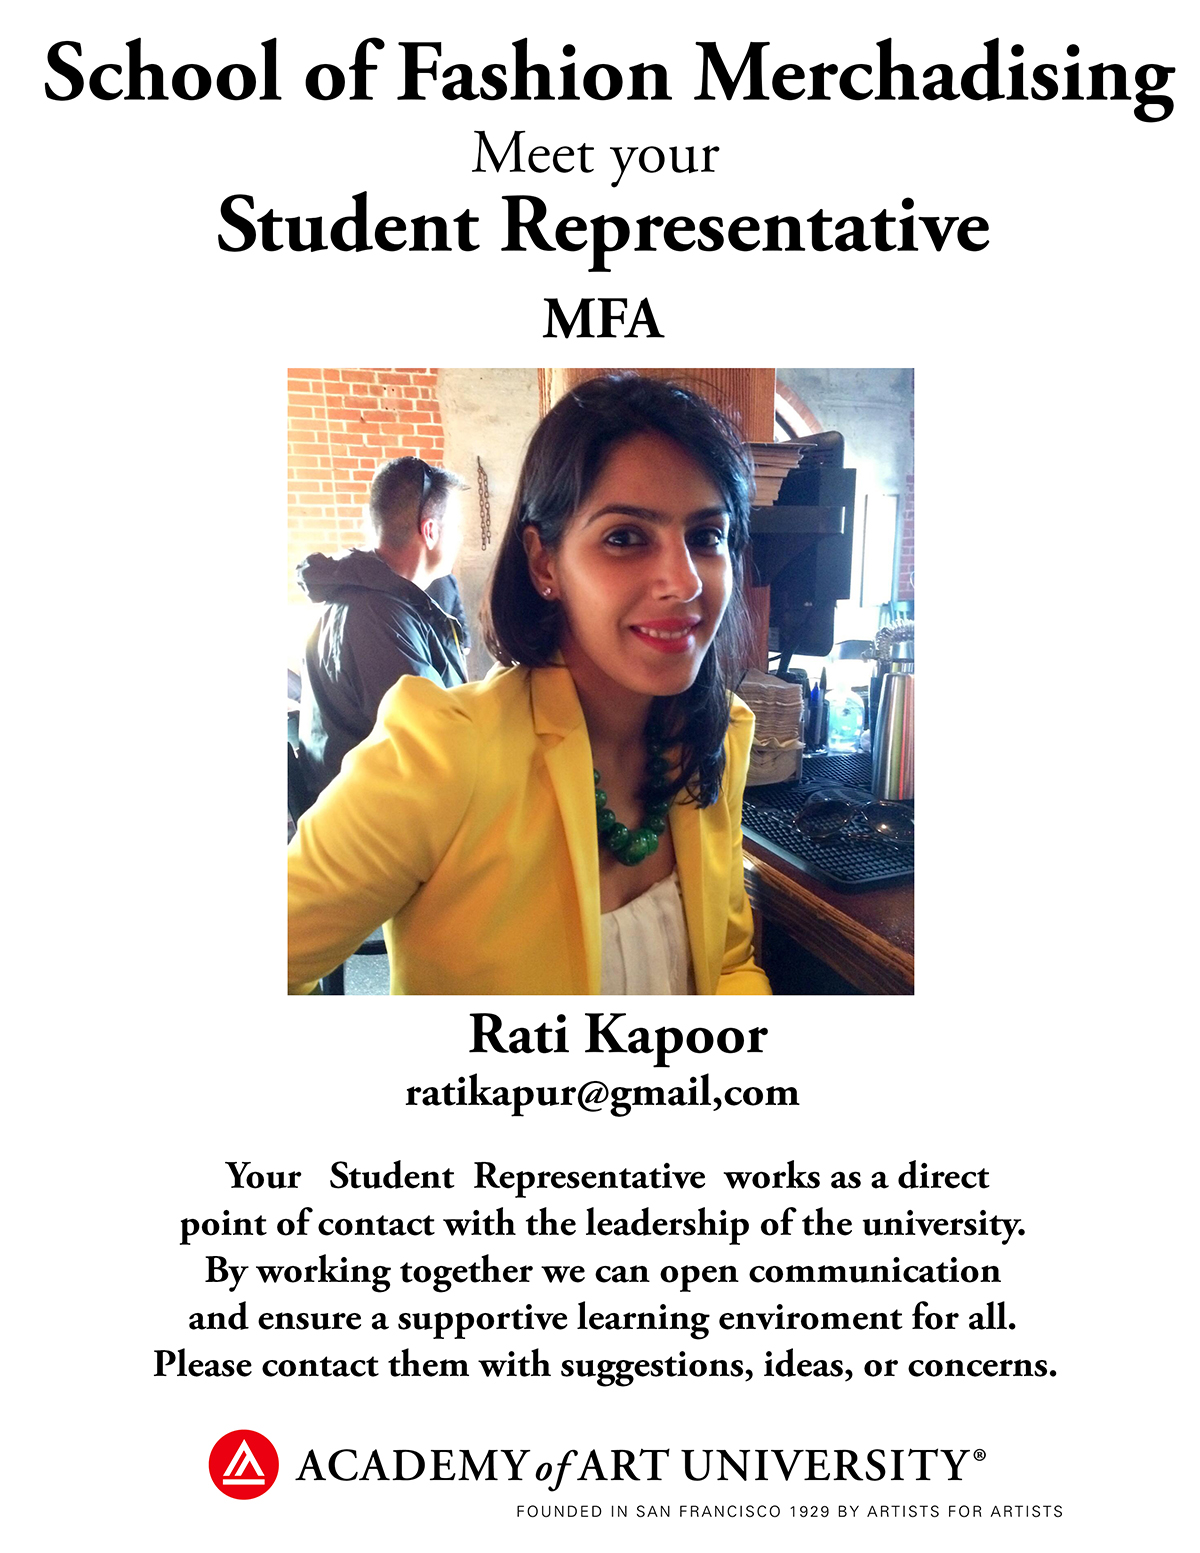 MFA Fashion Merchandising student representative Rati Kapoor/email: ratikapur@gmail.com